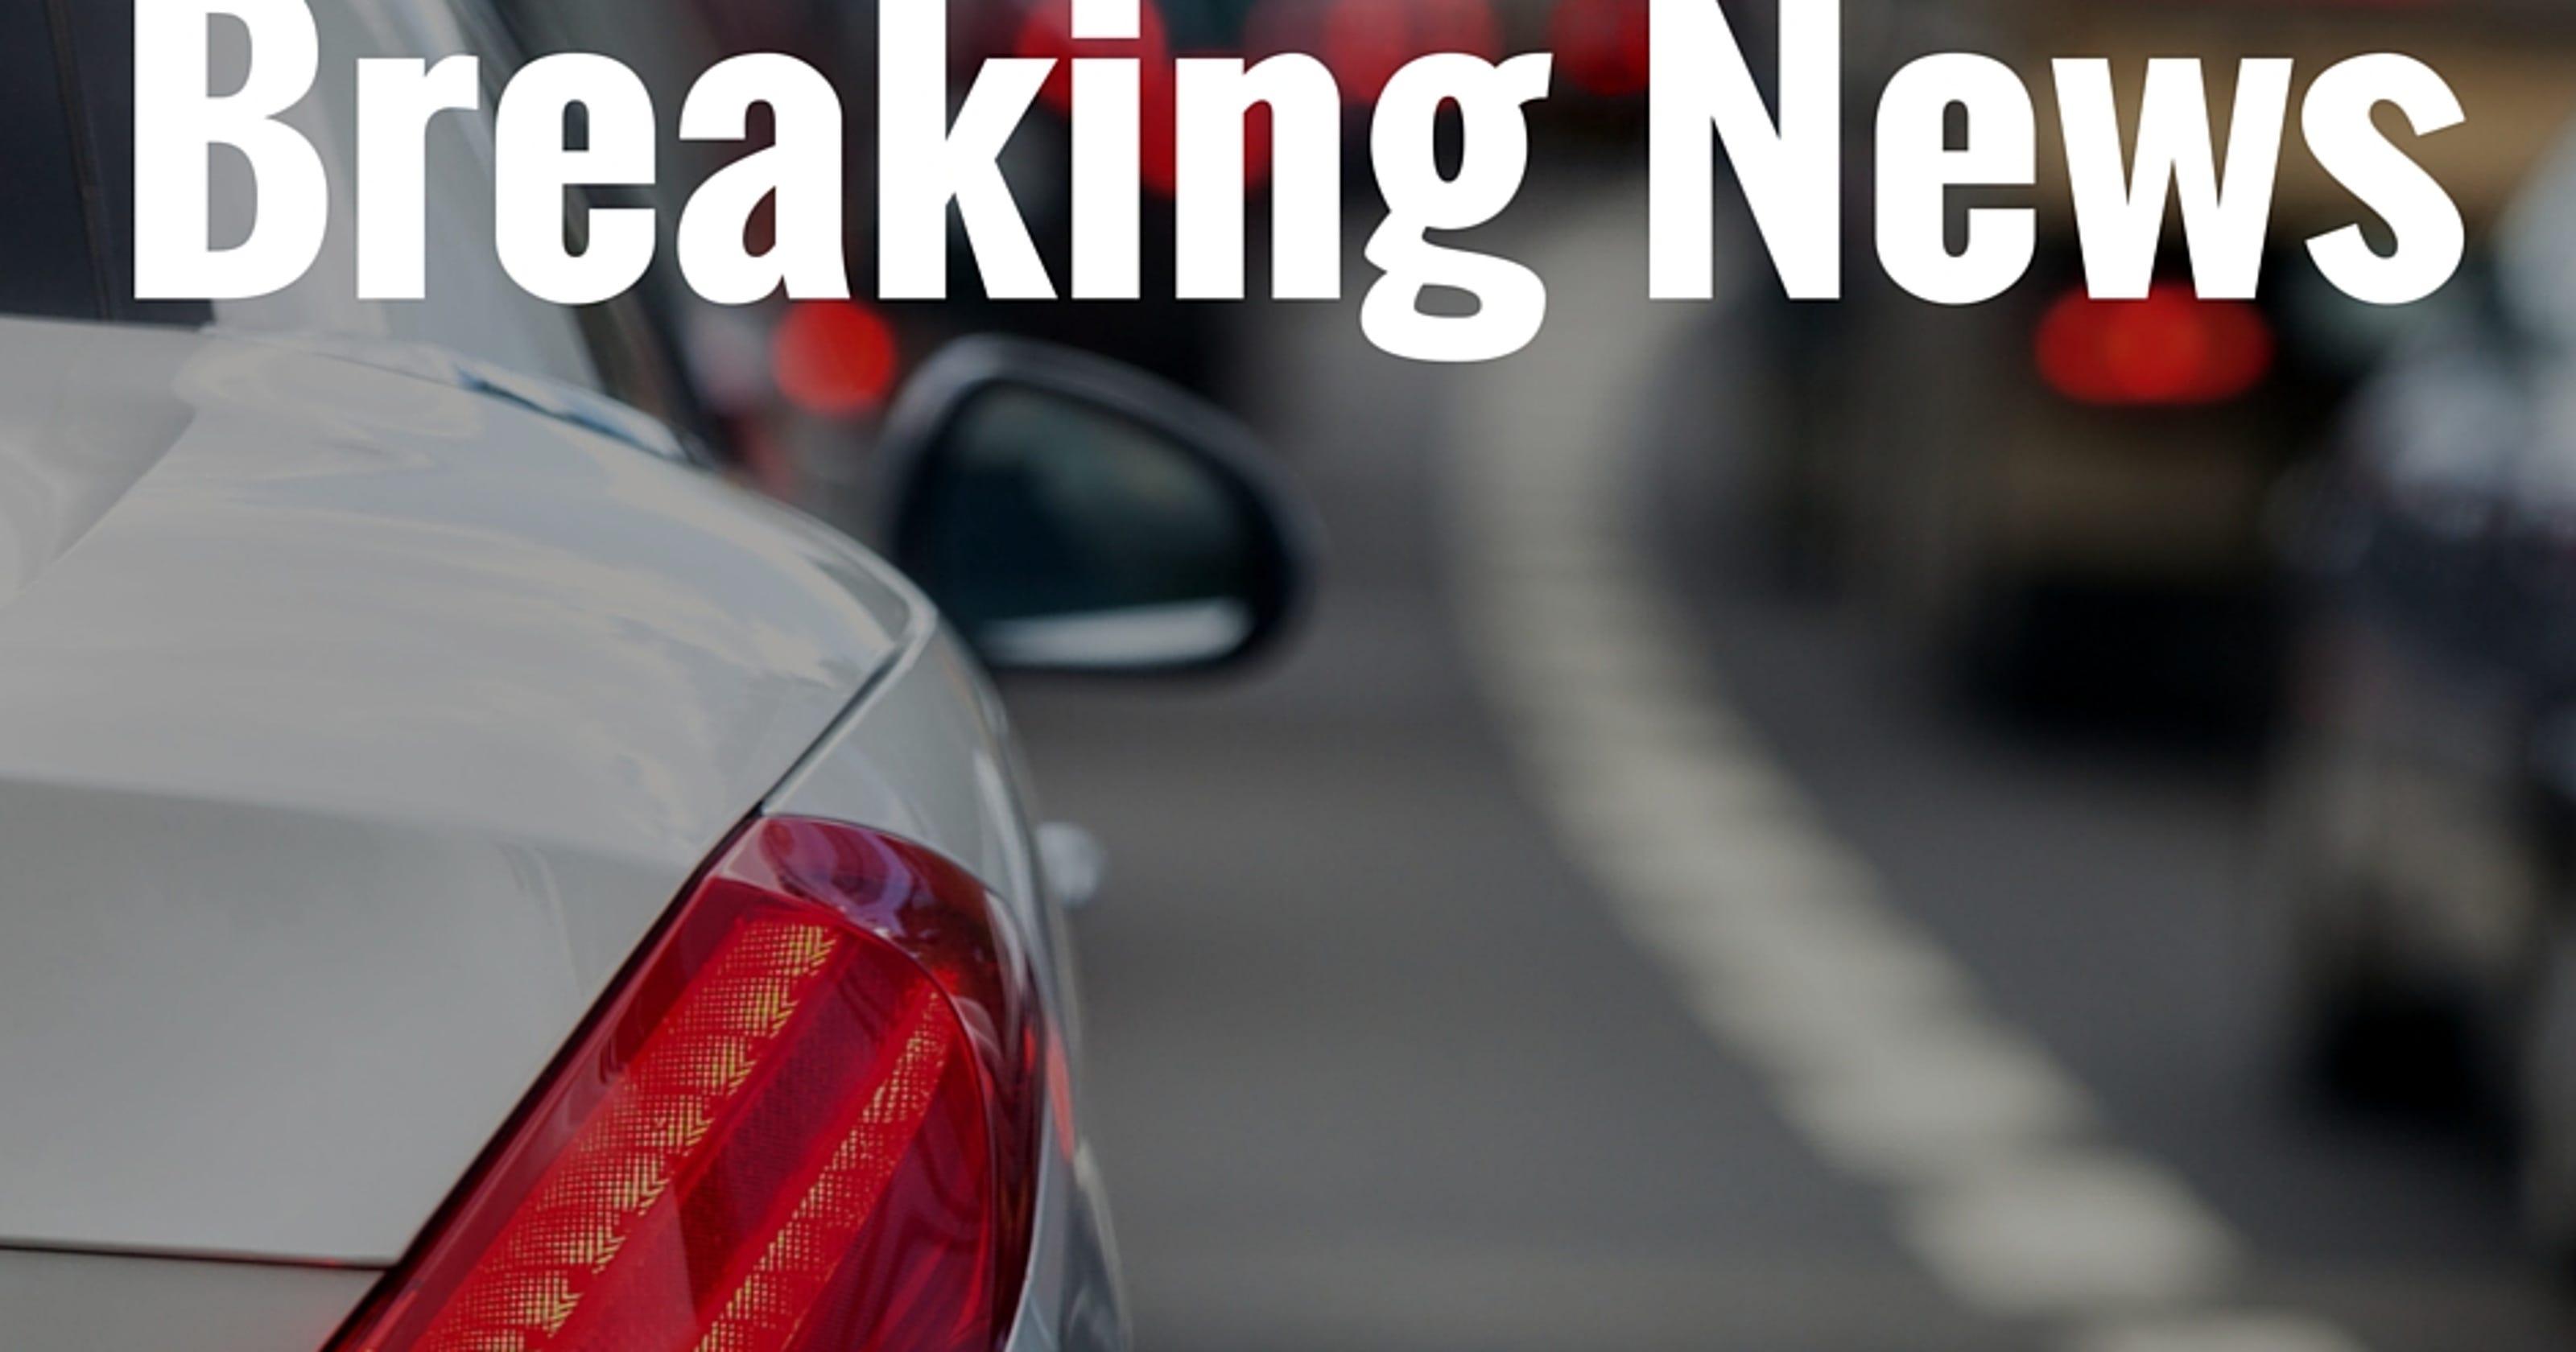 Fatal motorcycle crash on Colorado I-25 kills 1